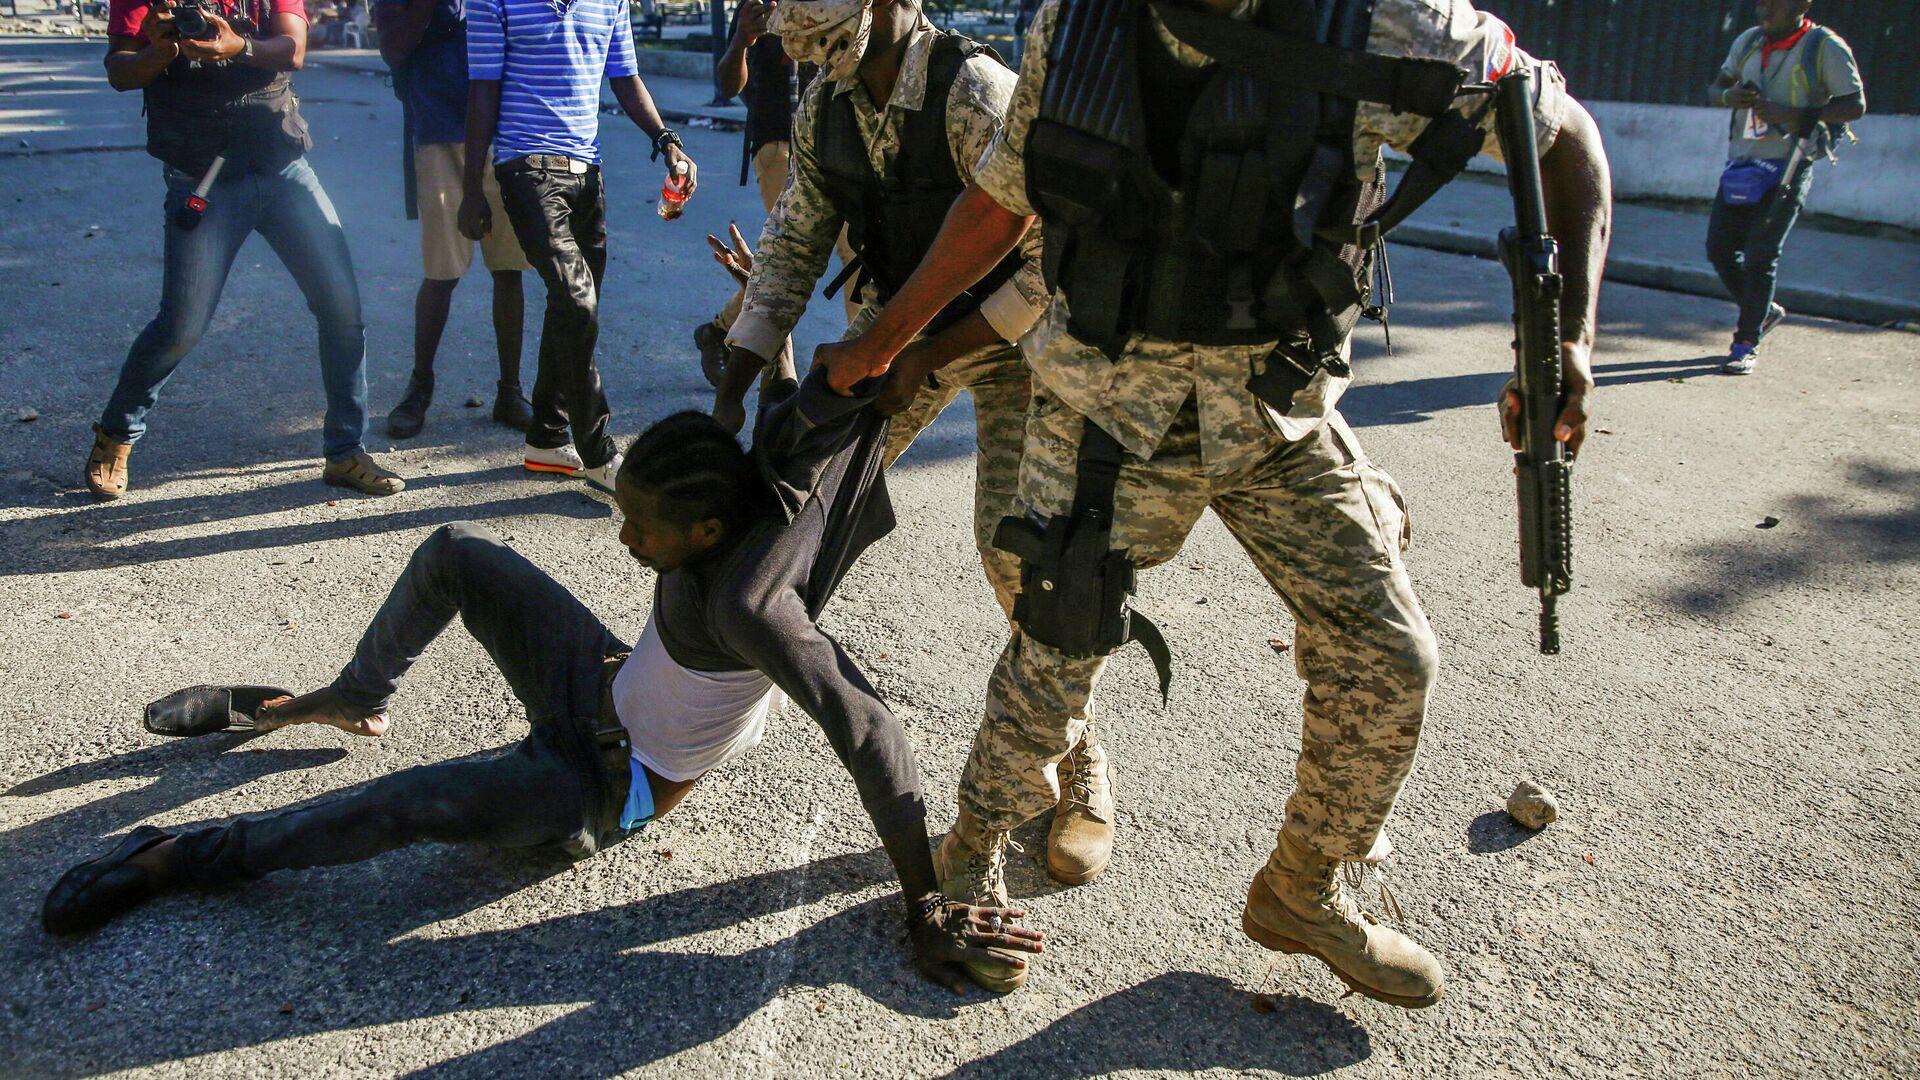 Violencia en Haití - Sputnik Mundo, 1920, 11.02.2021